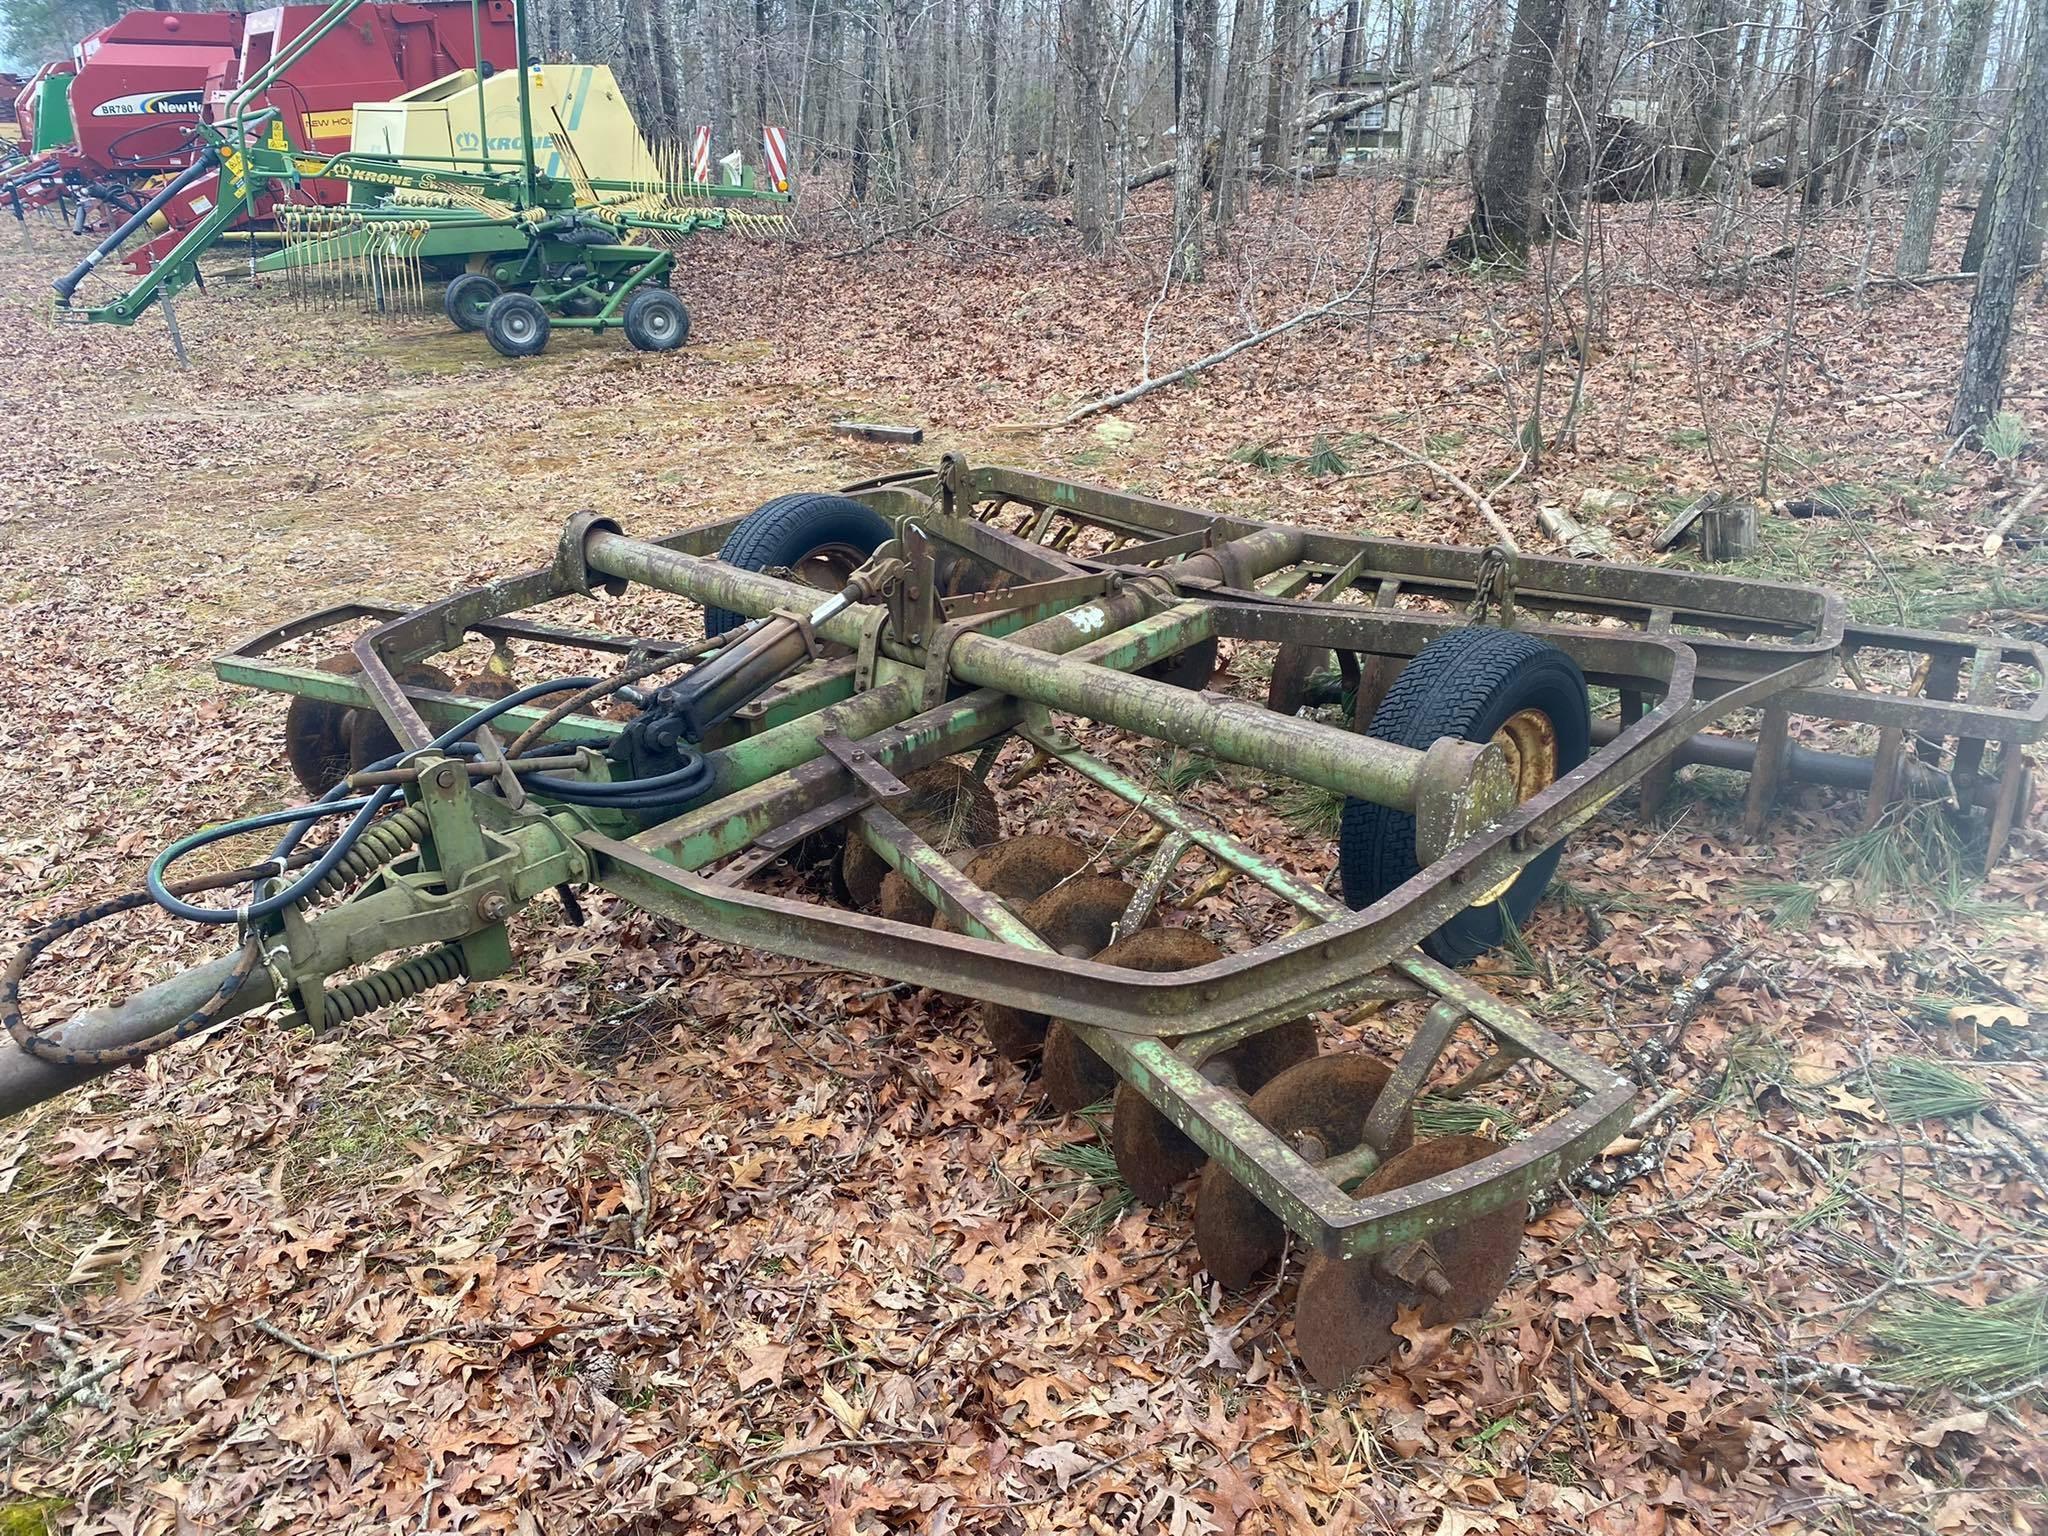 Used, 0, John Deere, John Deere 12ft Disc , Agricultural Equipment